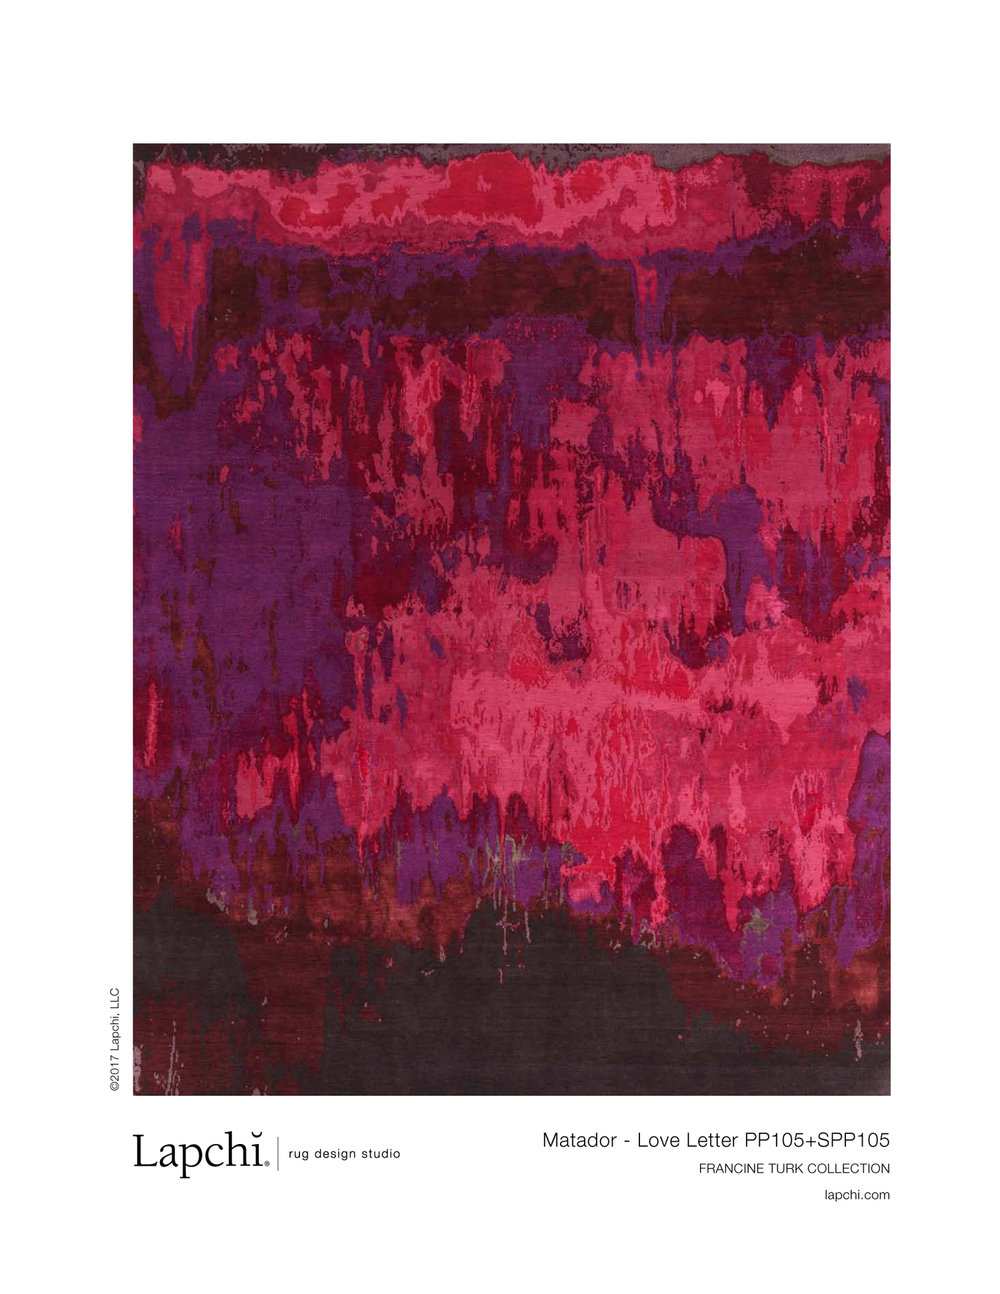 Matador area rug in love letter from Lapchi rug design studio.